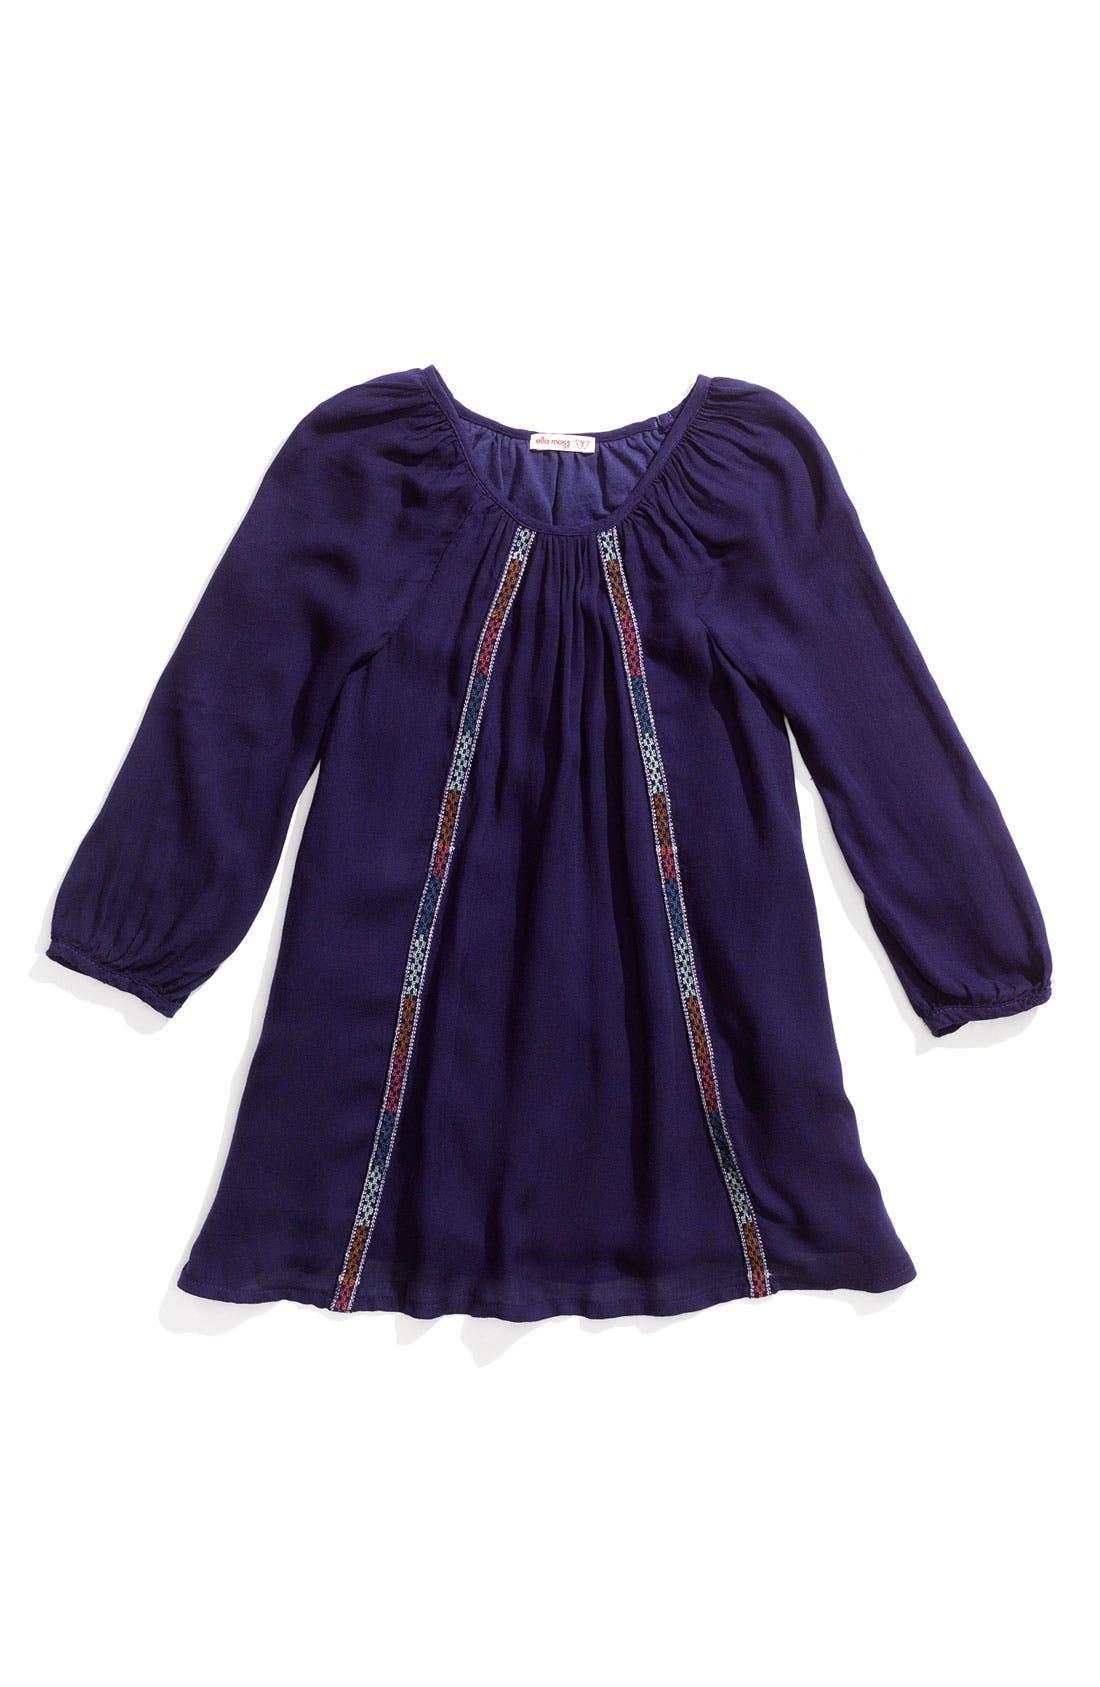 Main Image - Little Ella 'Surrey' Dress (Toddler)